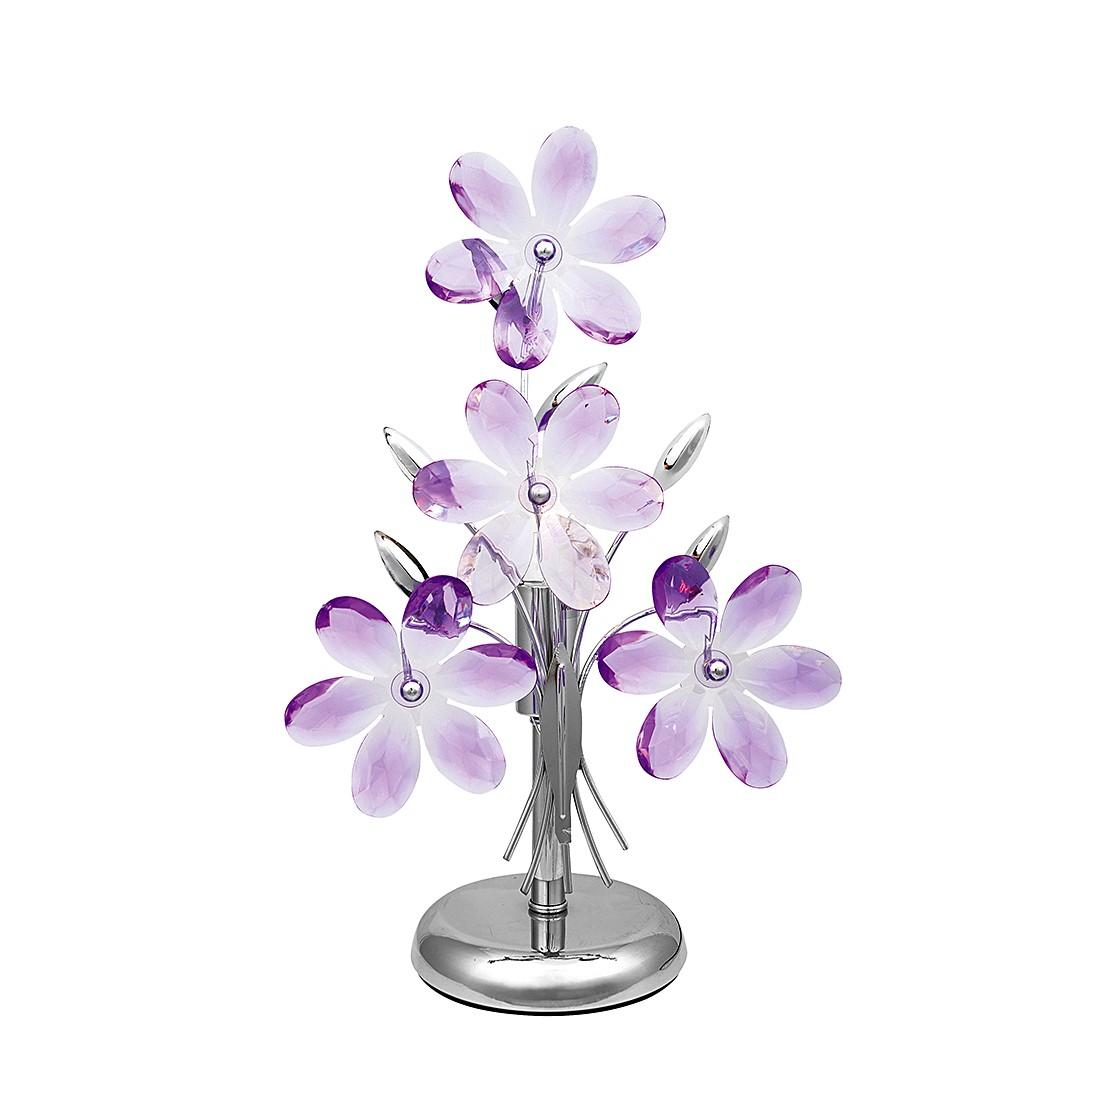 EEK A++, Tischleuchte Purple – 1-flammig, Globo Lighting günstig